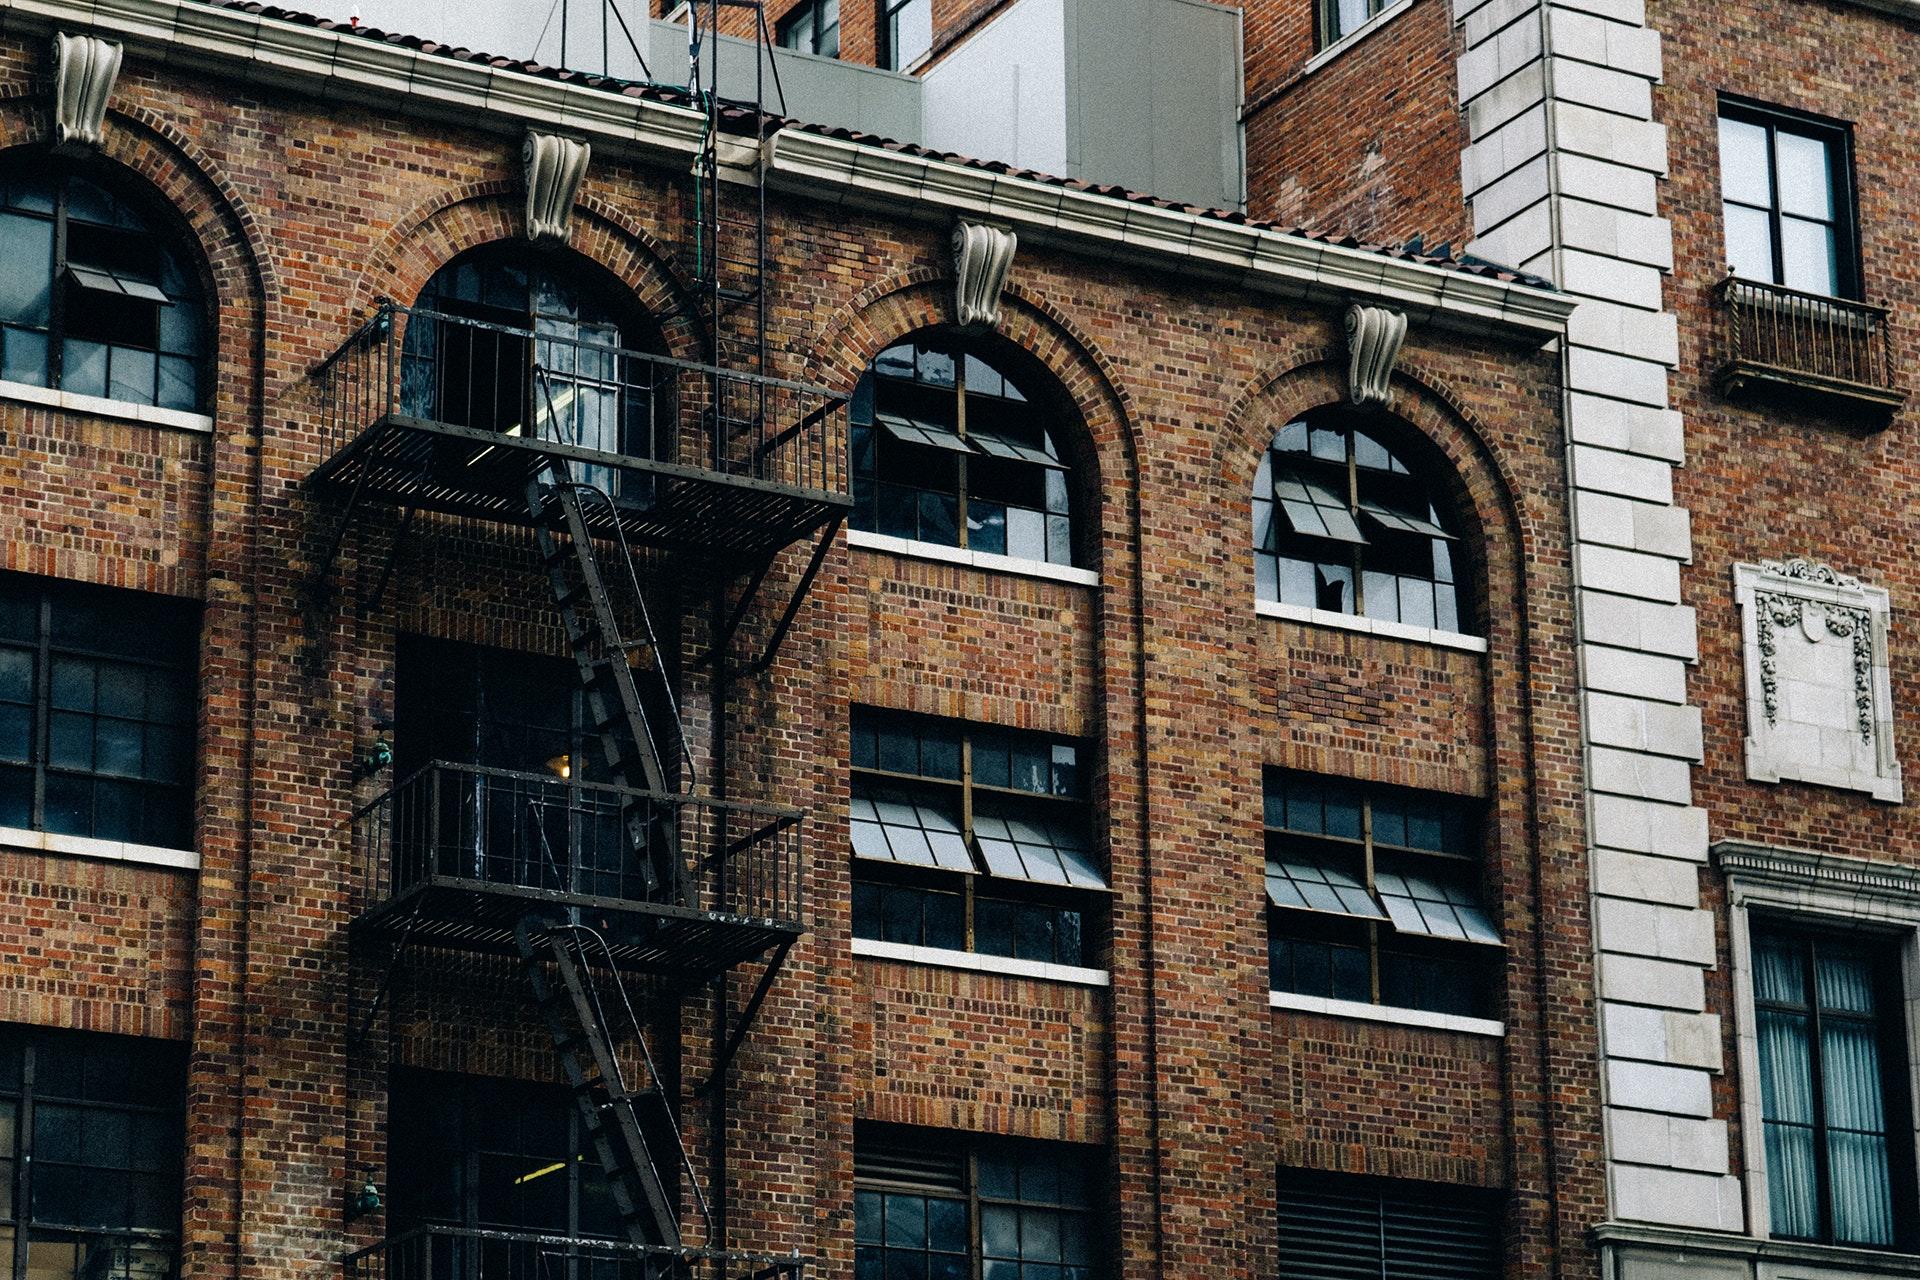 Window Fire Escape Ladder For Buildings